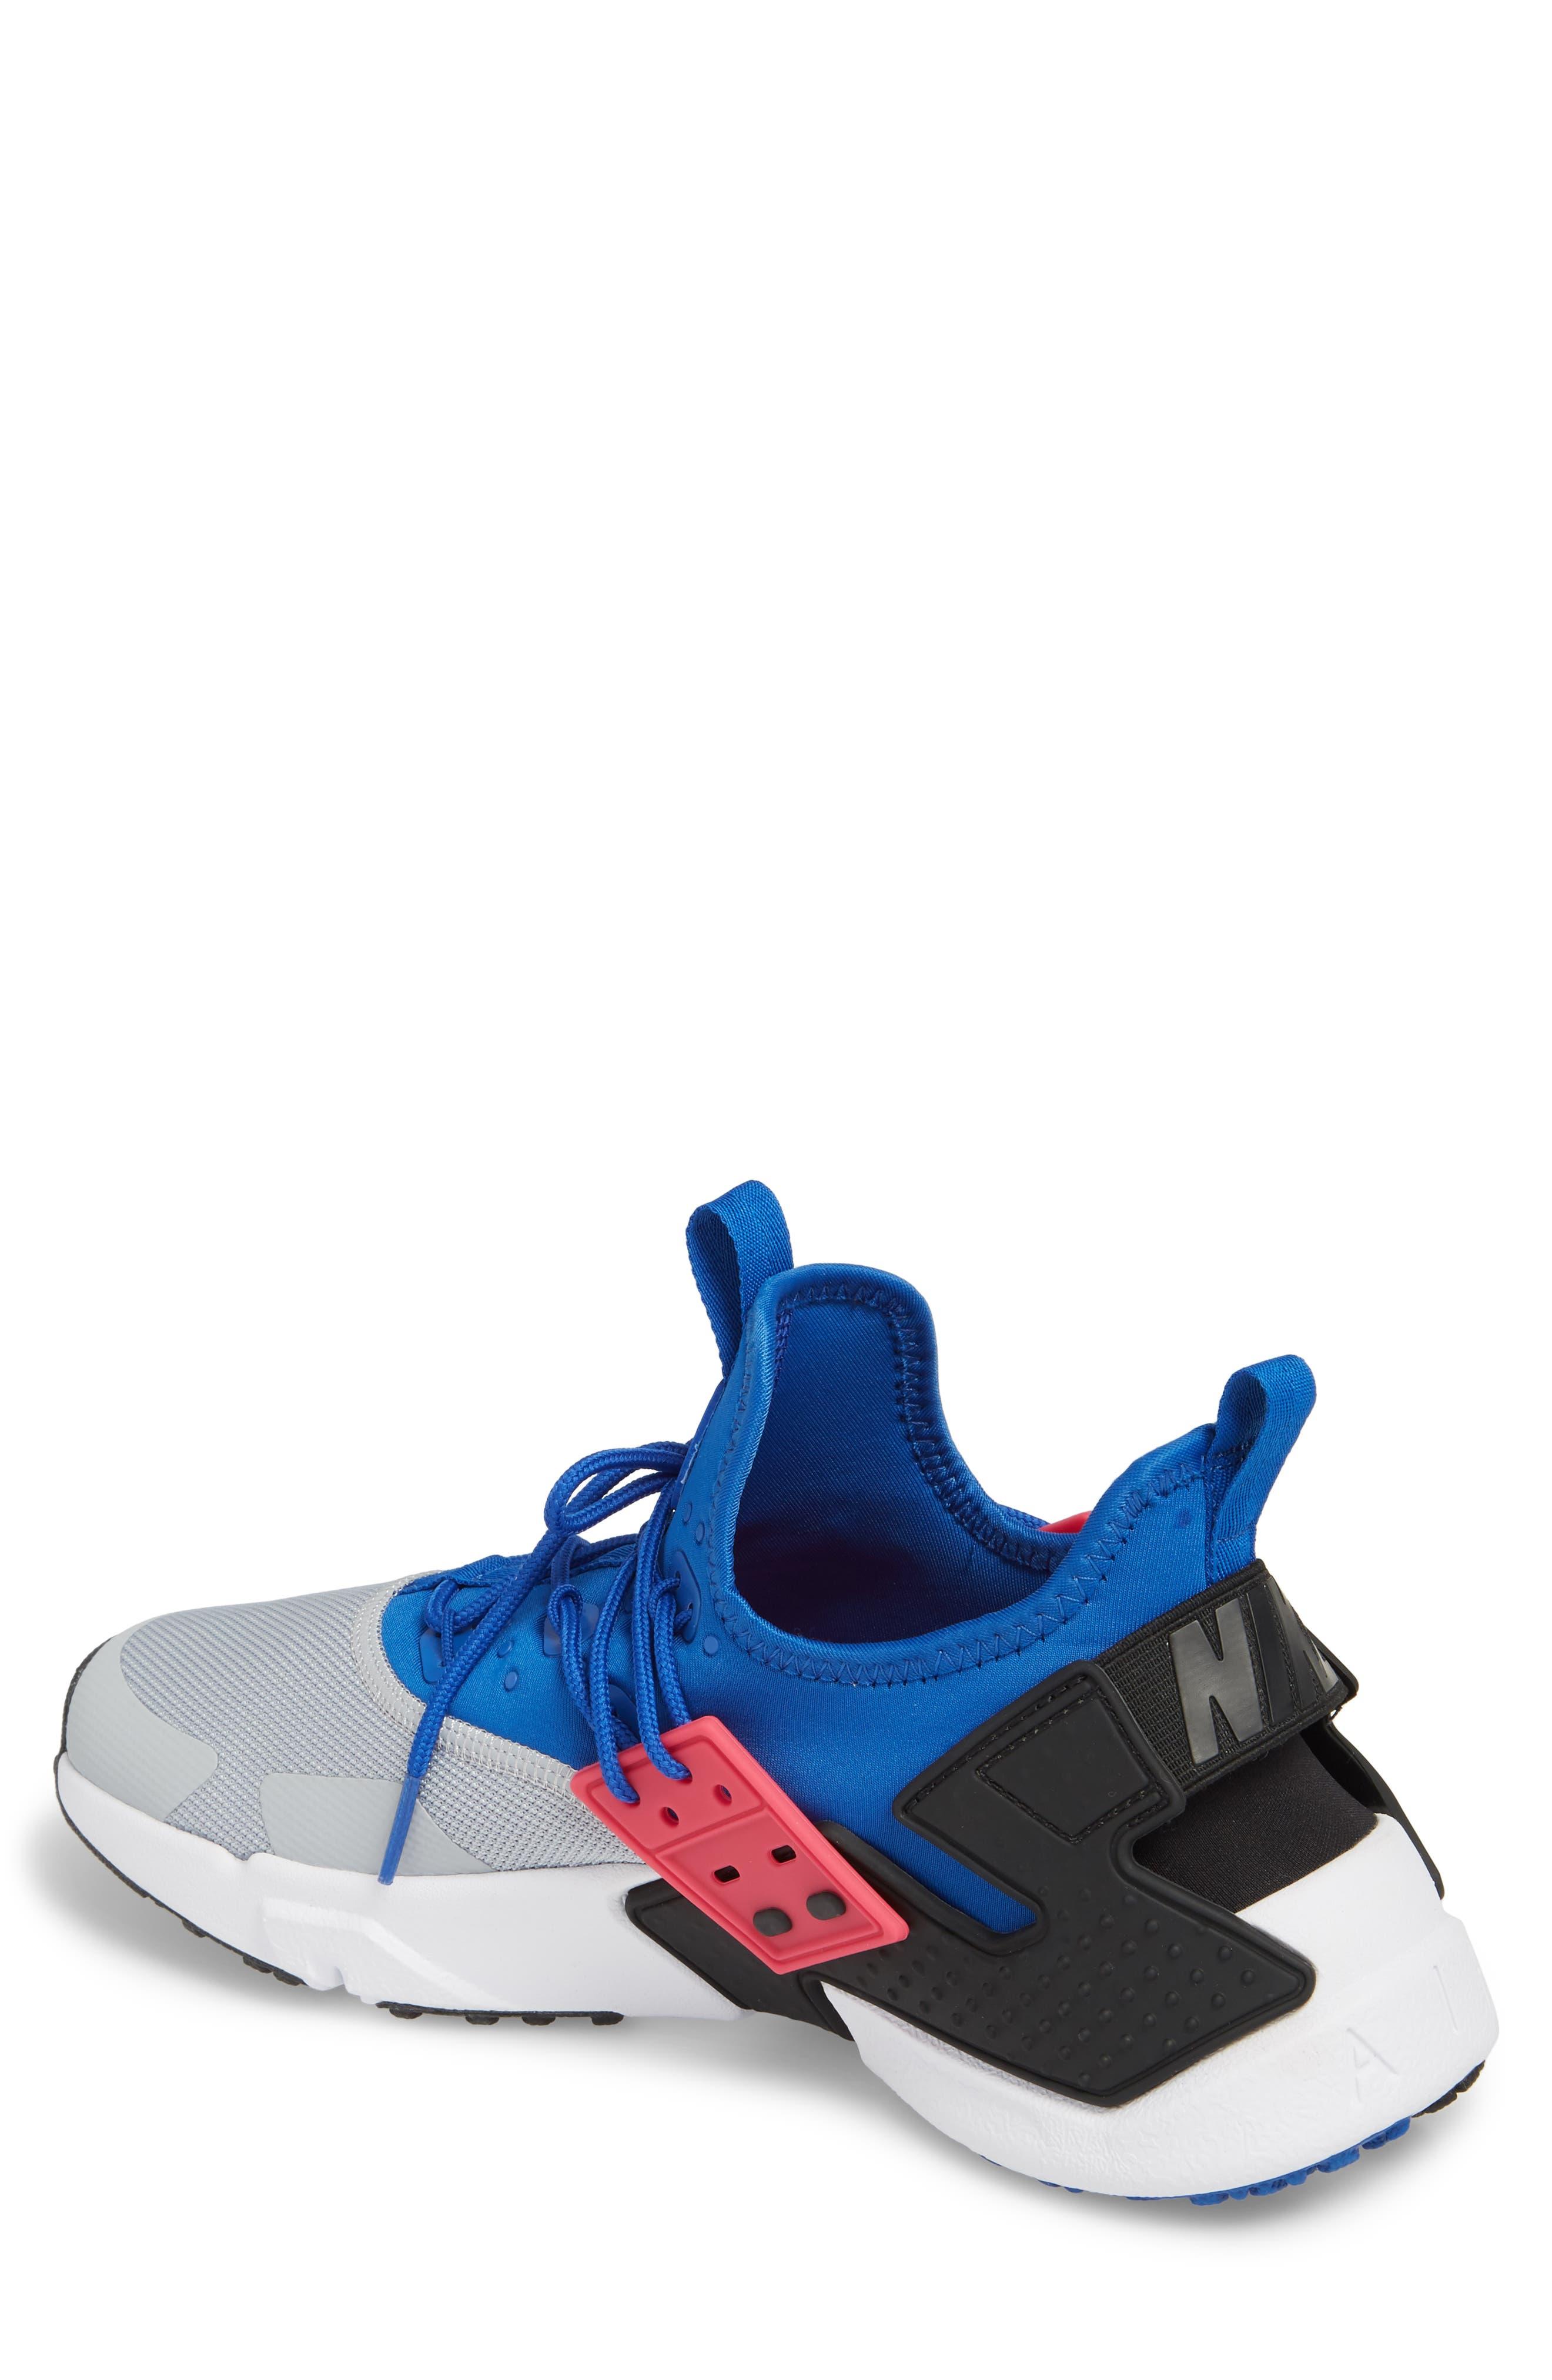 Air Huarache Drift Sneaker,                             Alternate thumbnail 2, color,                             Game Royal/ White/ Wolf Grey